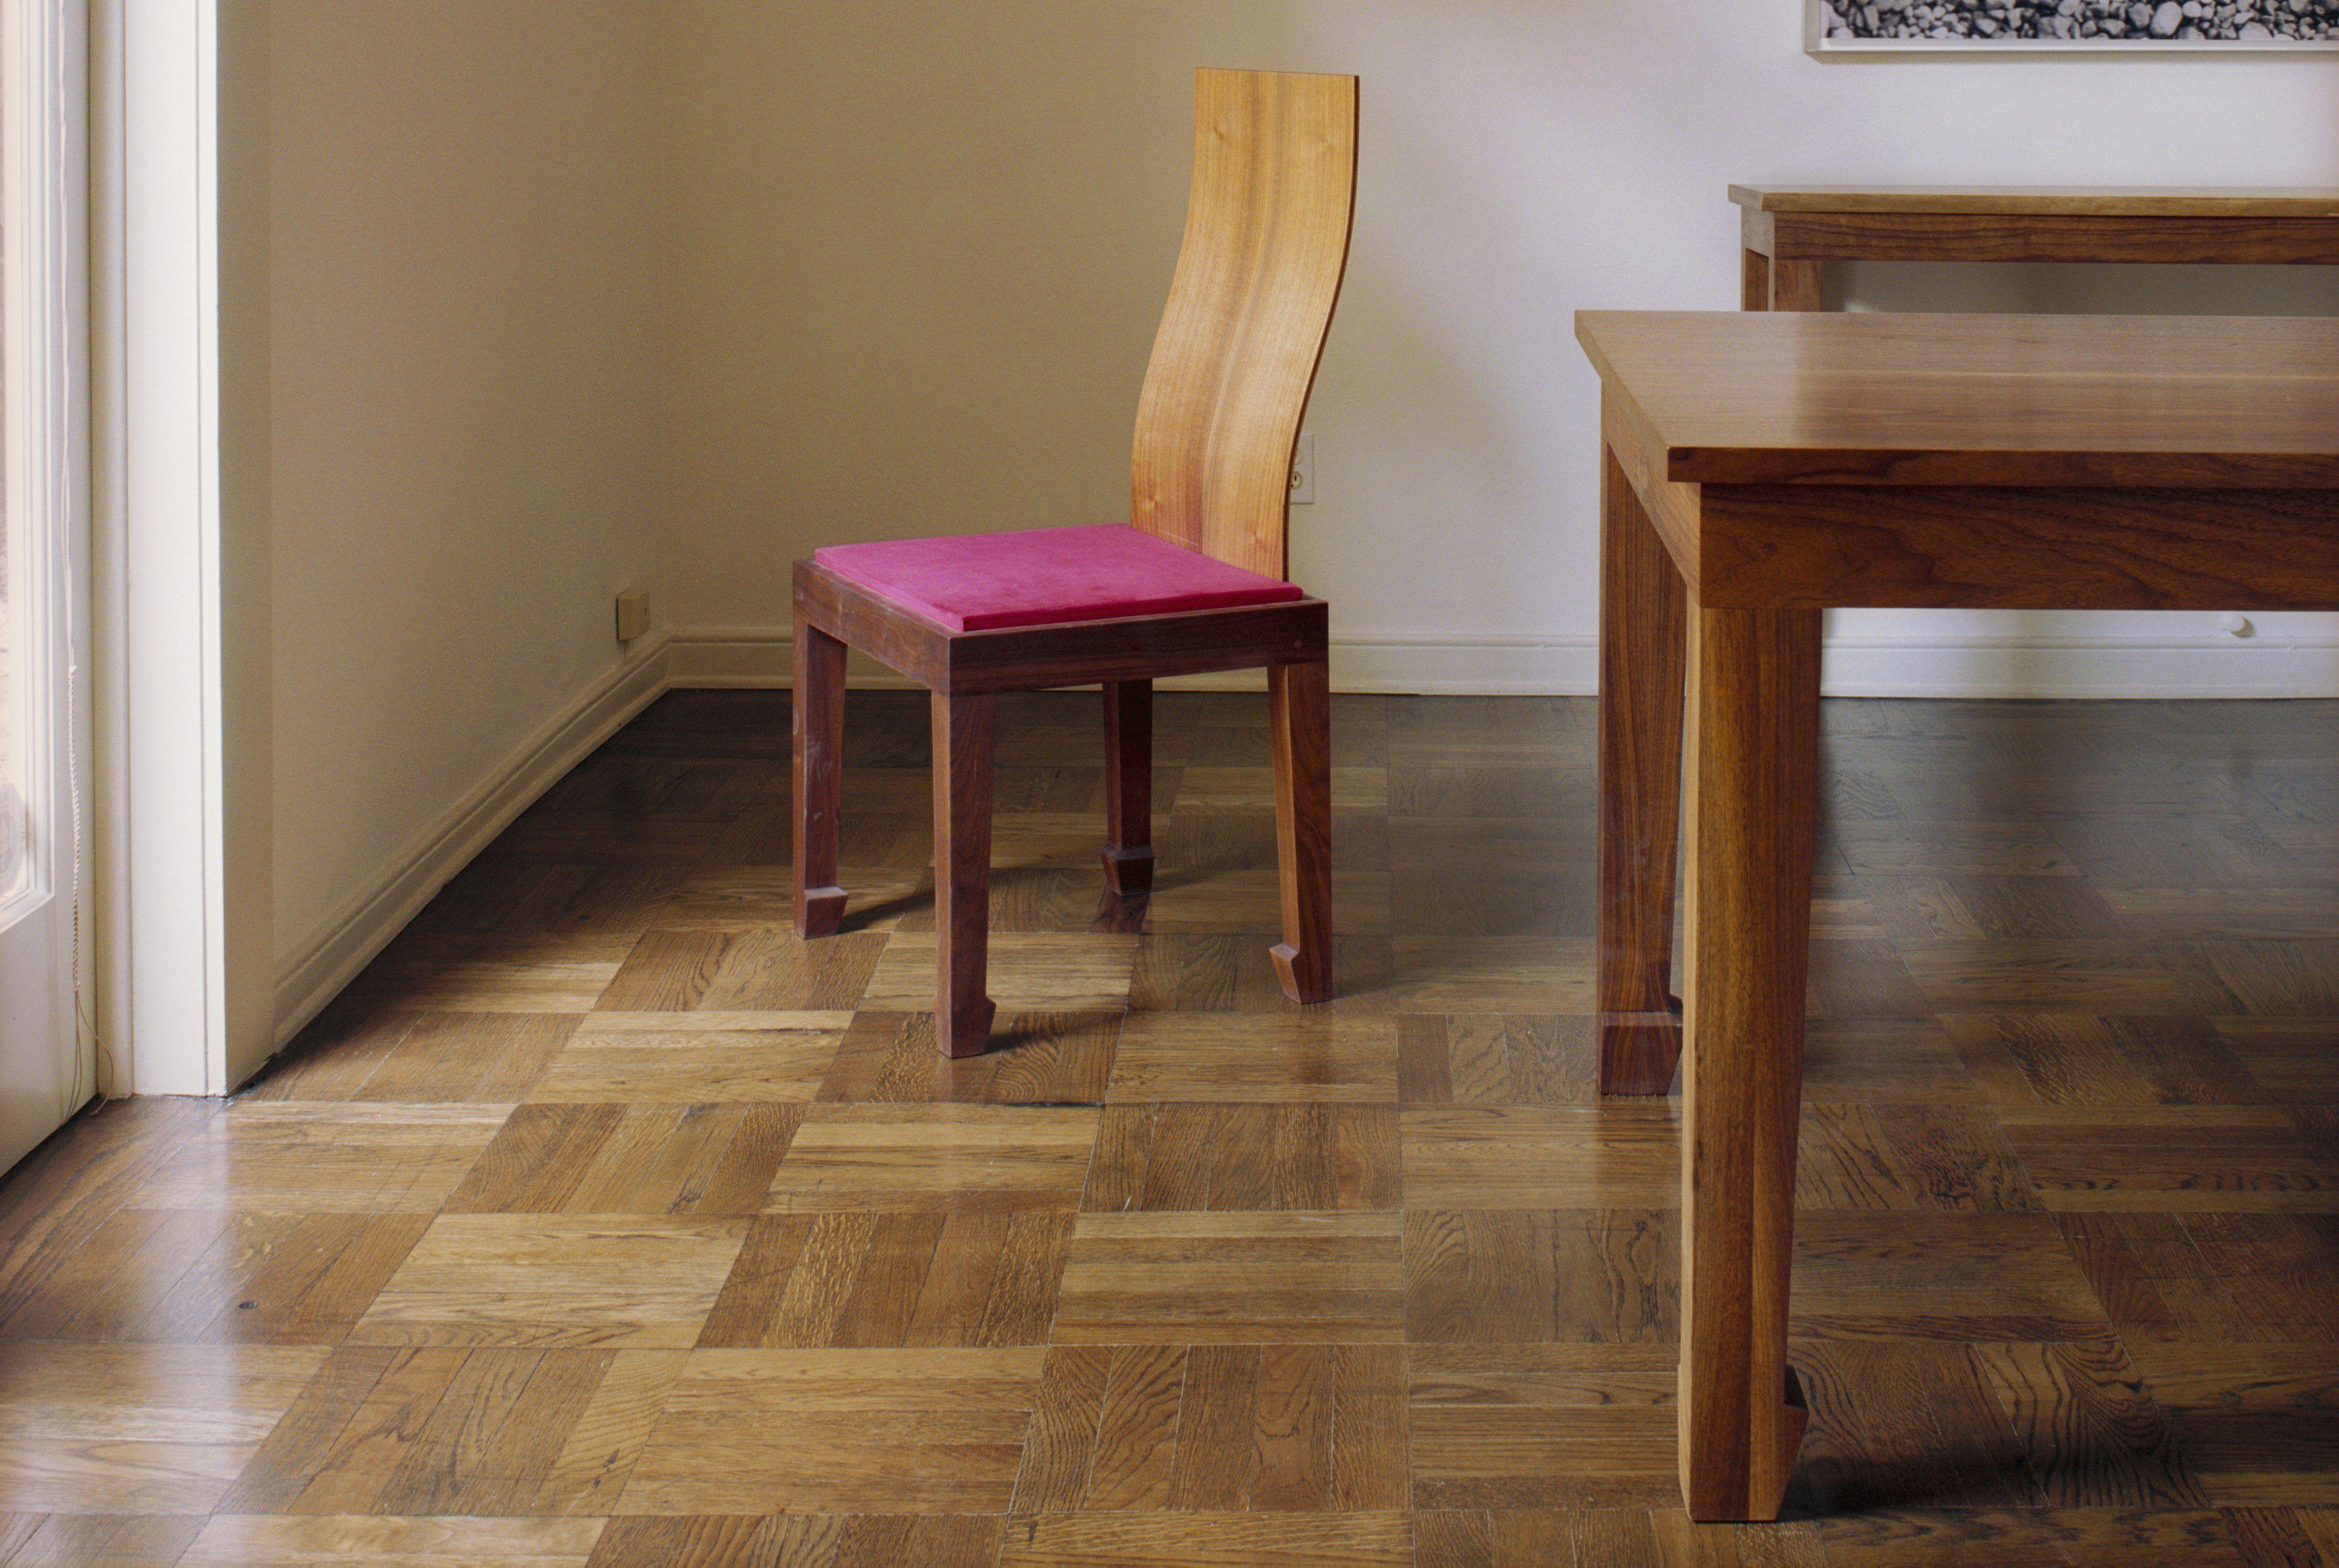 glue down solid hardwood floor of wood parquet flooring poised for a resurgence regarding wood parquet flooring 529502452 576c78195f9b585875a1ac13